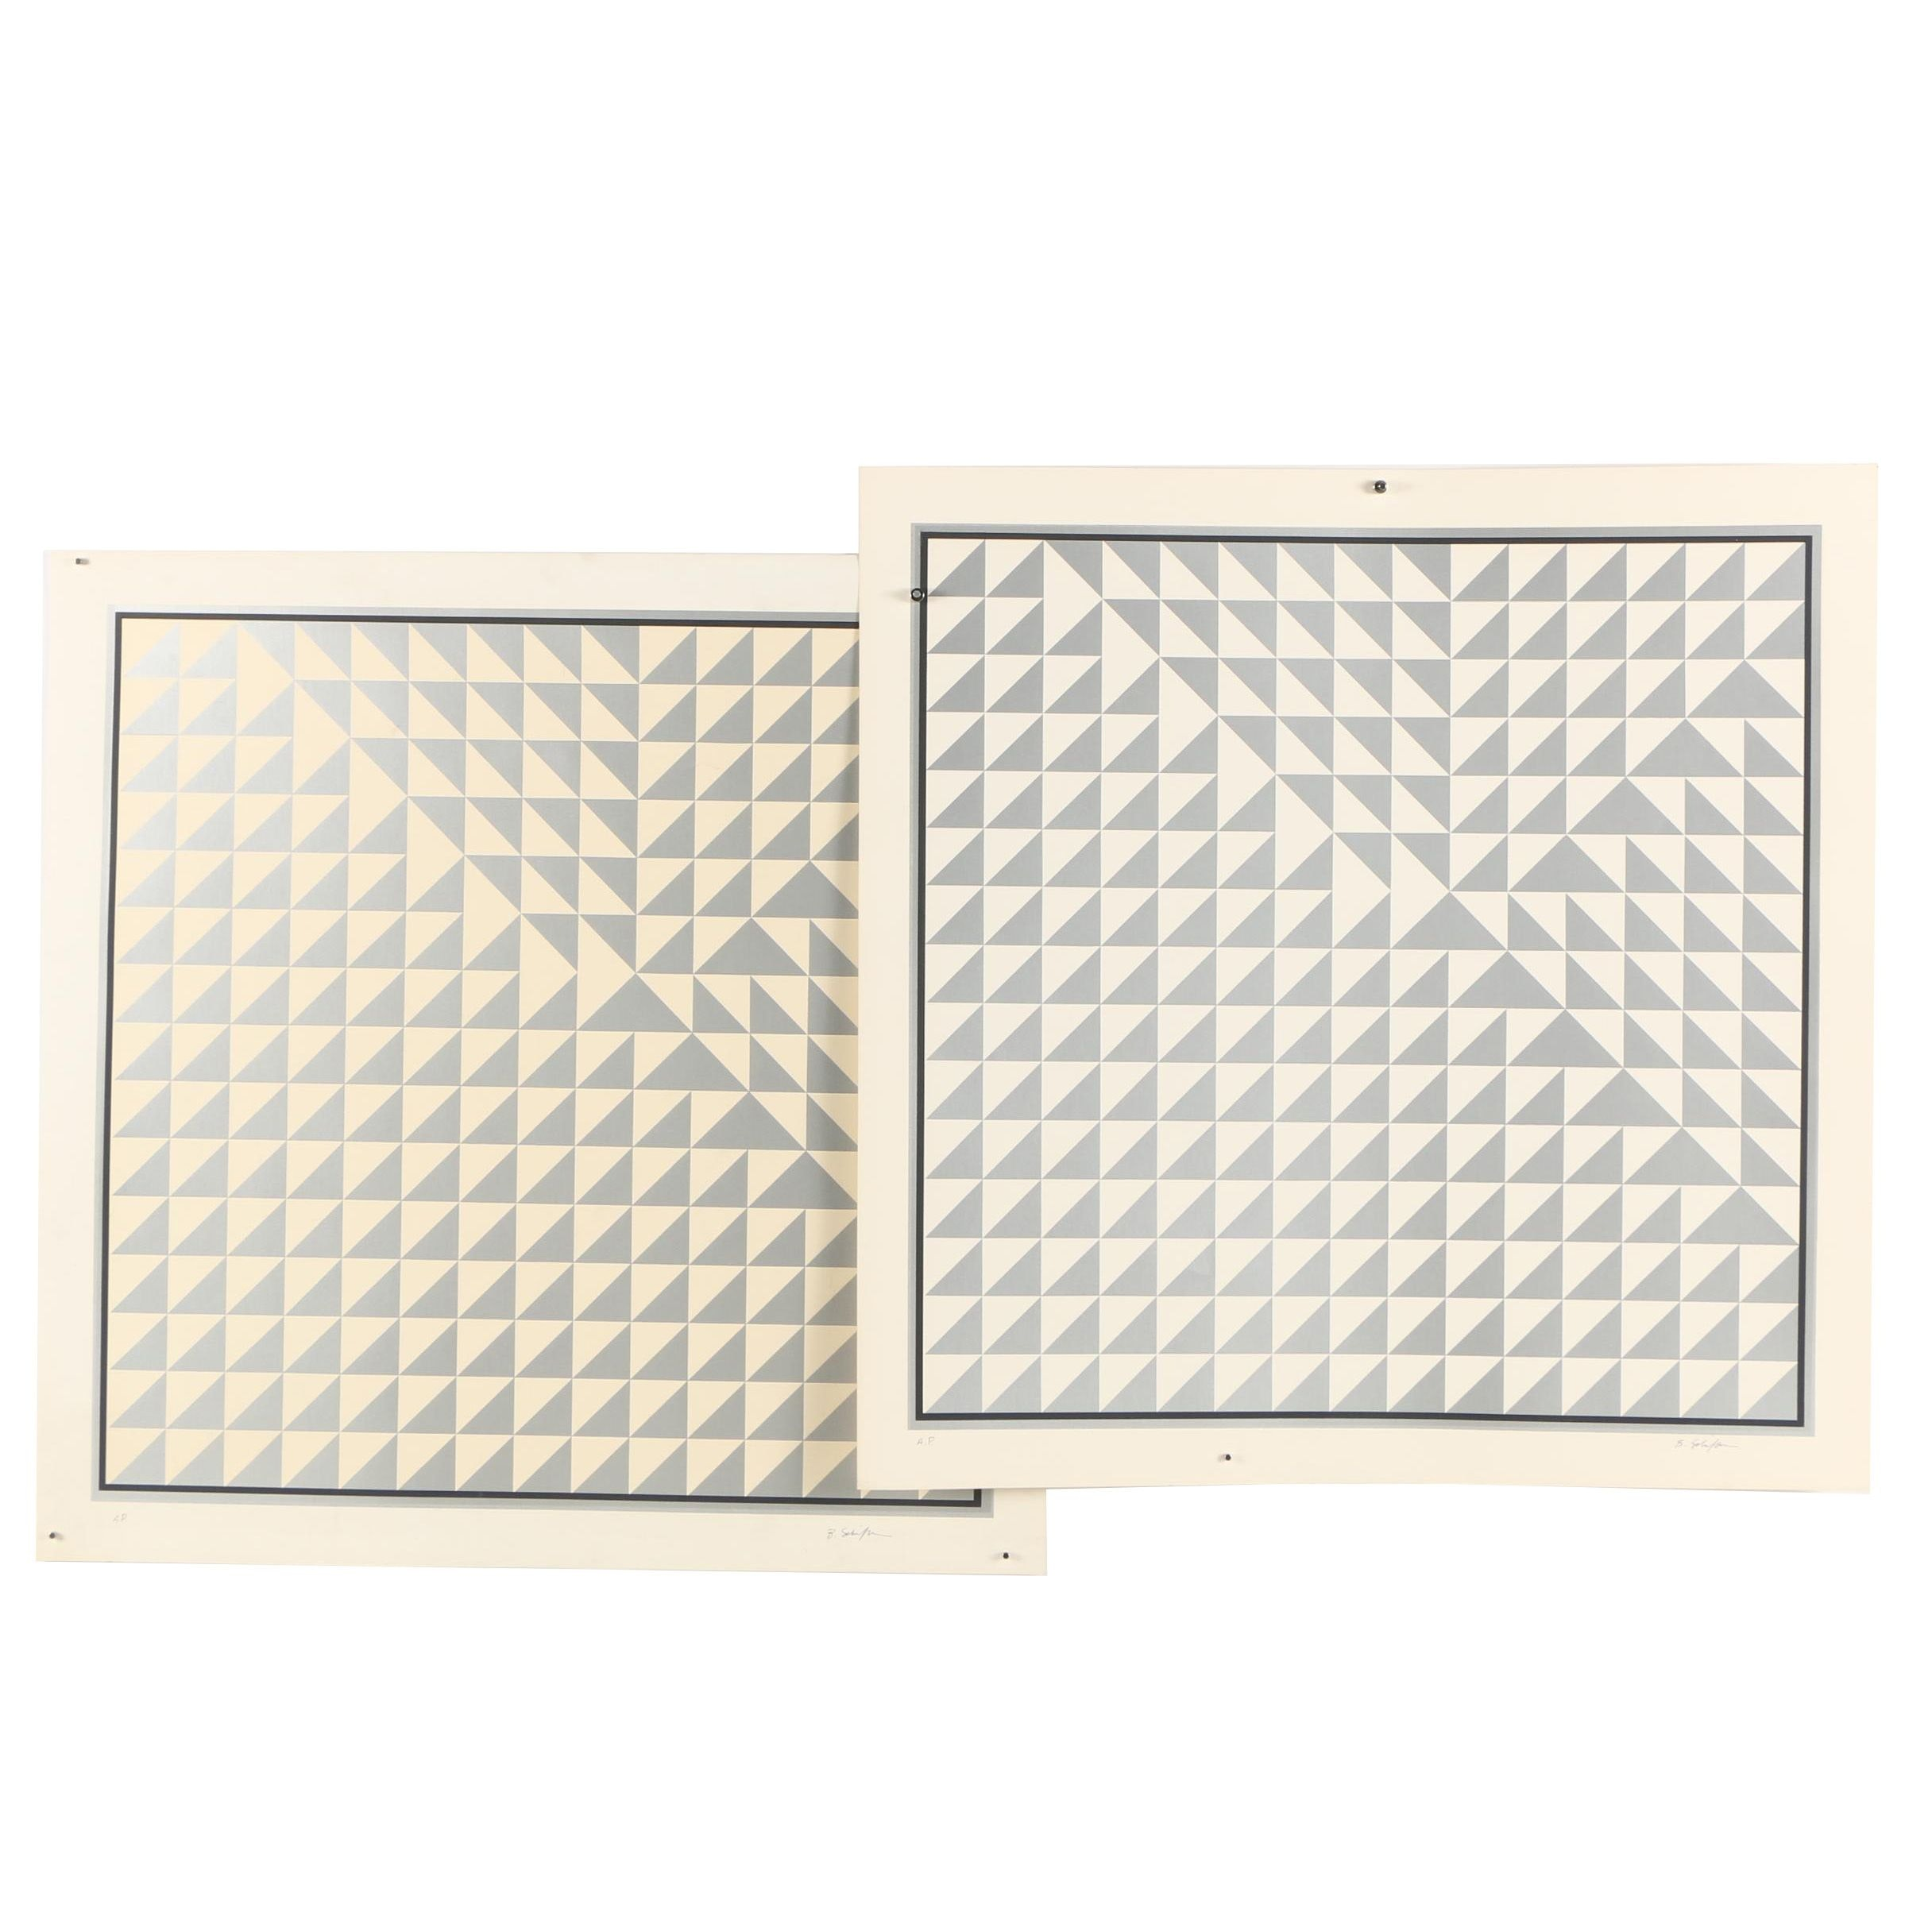 Bill Schiffer Op Art Serigraphs of Triangular Patterns